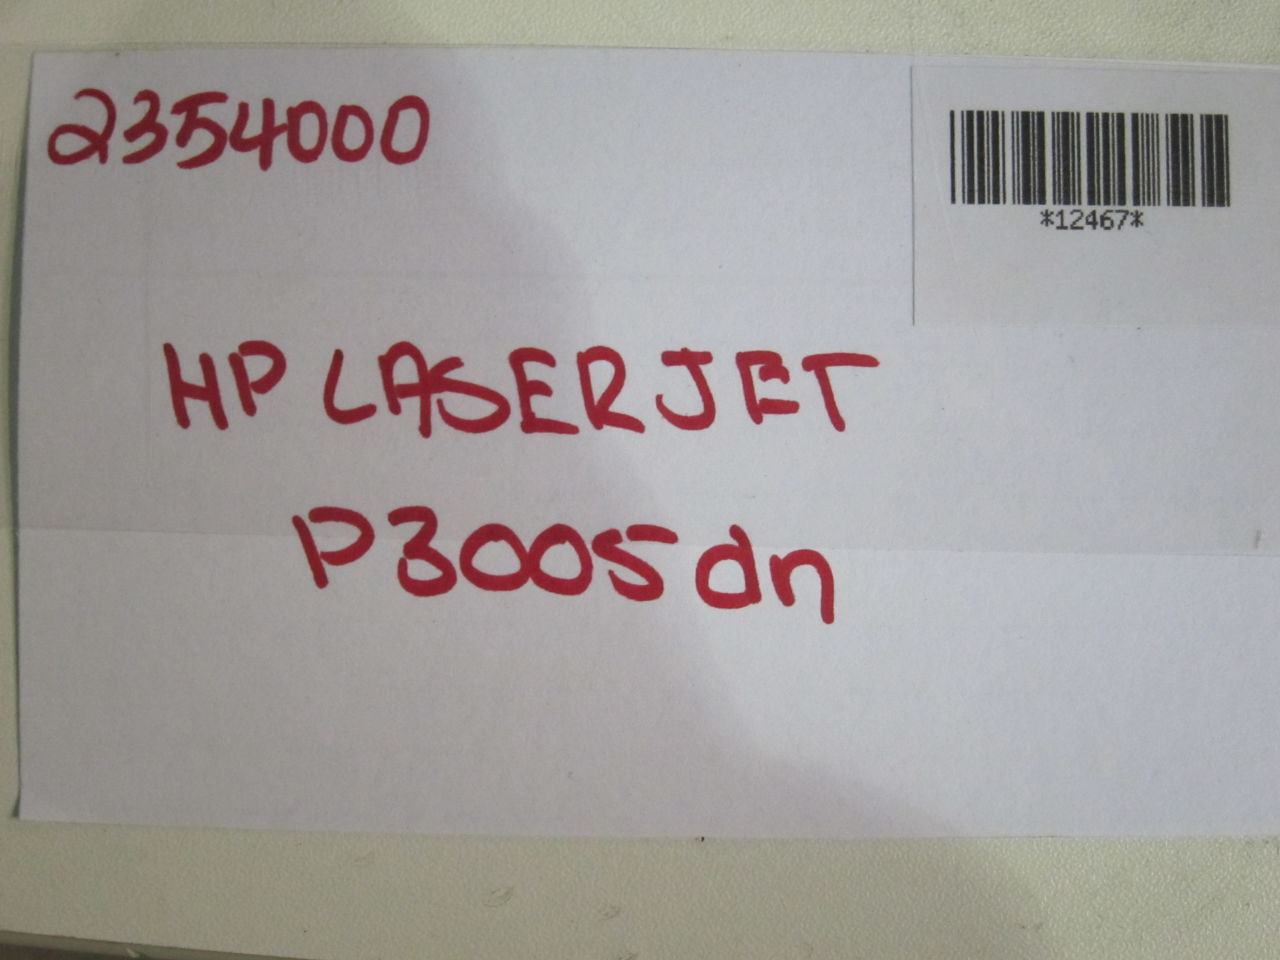 HP Laserjet P3005dn Printer